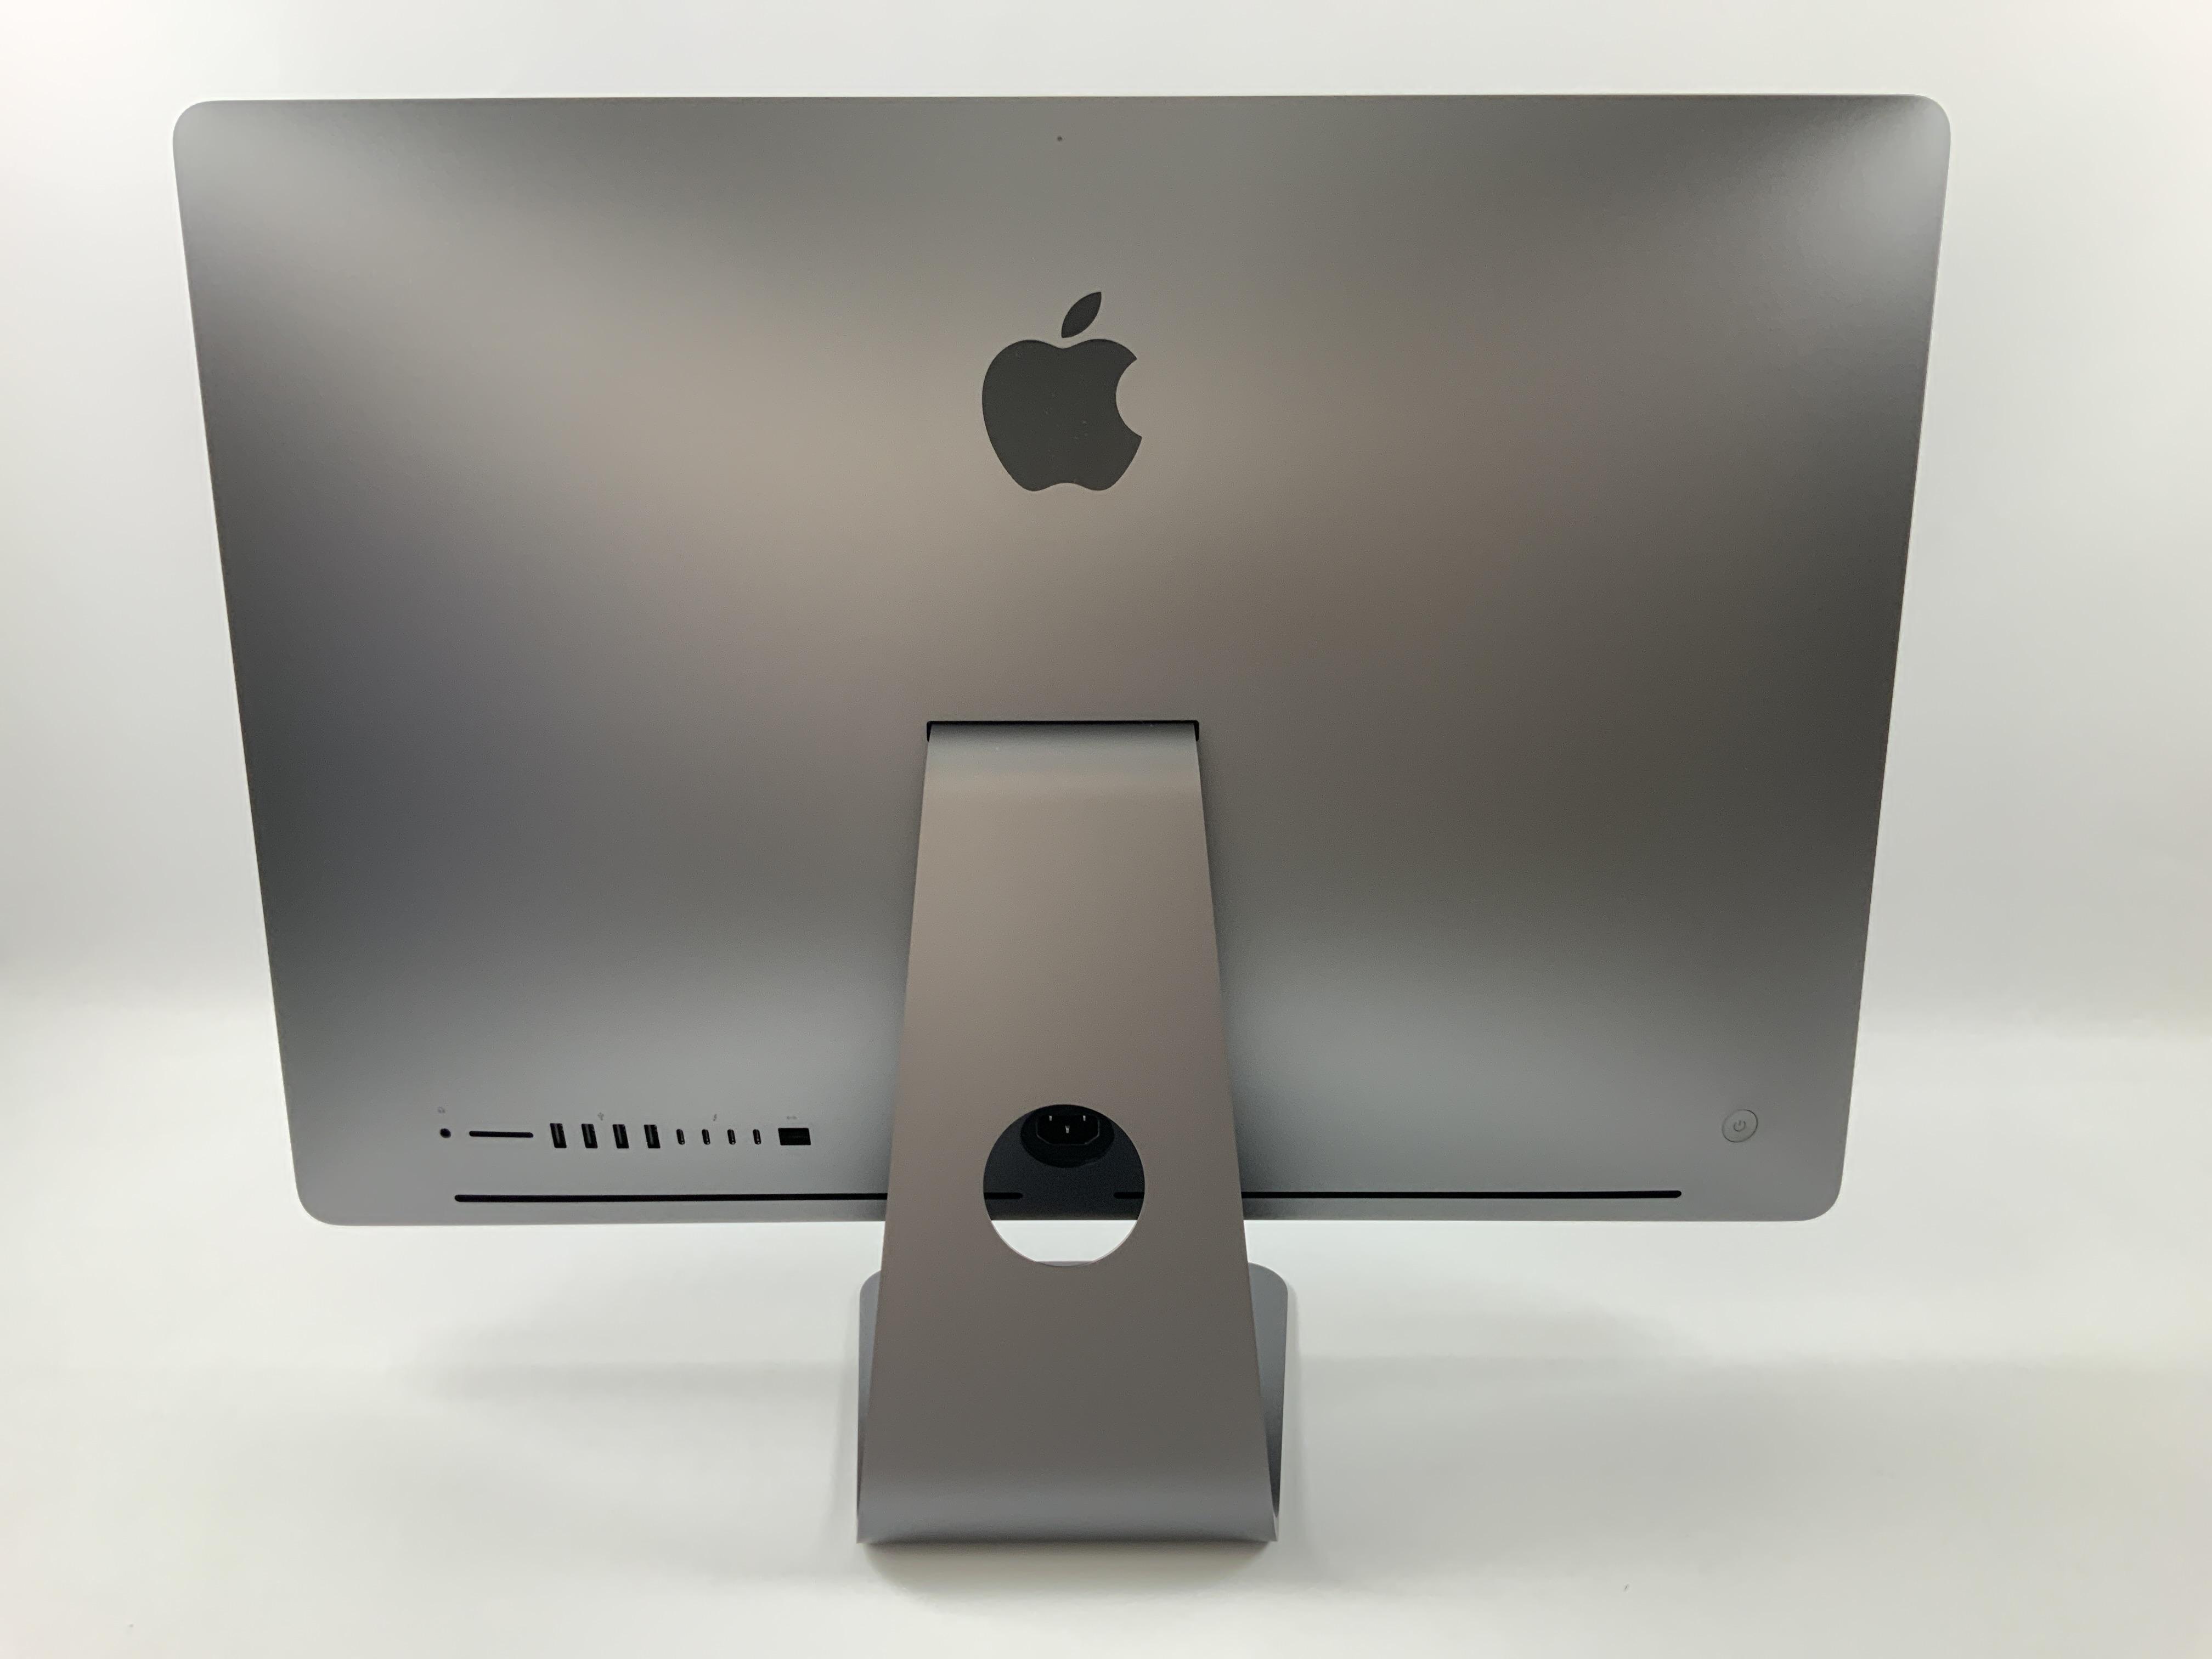 iMac Pro 2017 (Intel 8-Core Xeon W 3.2 GHz 32 GB RAM 1 TB SSD), Intel 8-Core Xeon W 3.2 GHz, 32 GB RAM, 1 TB SSD, Bild 2